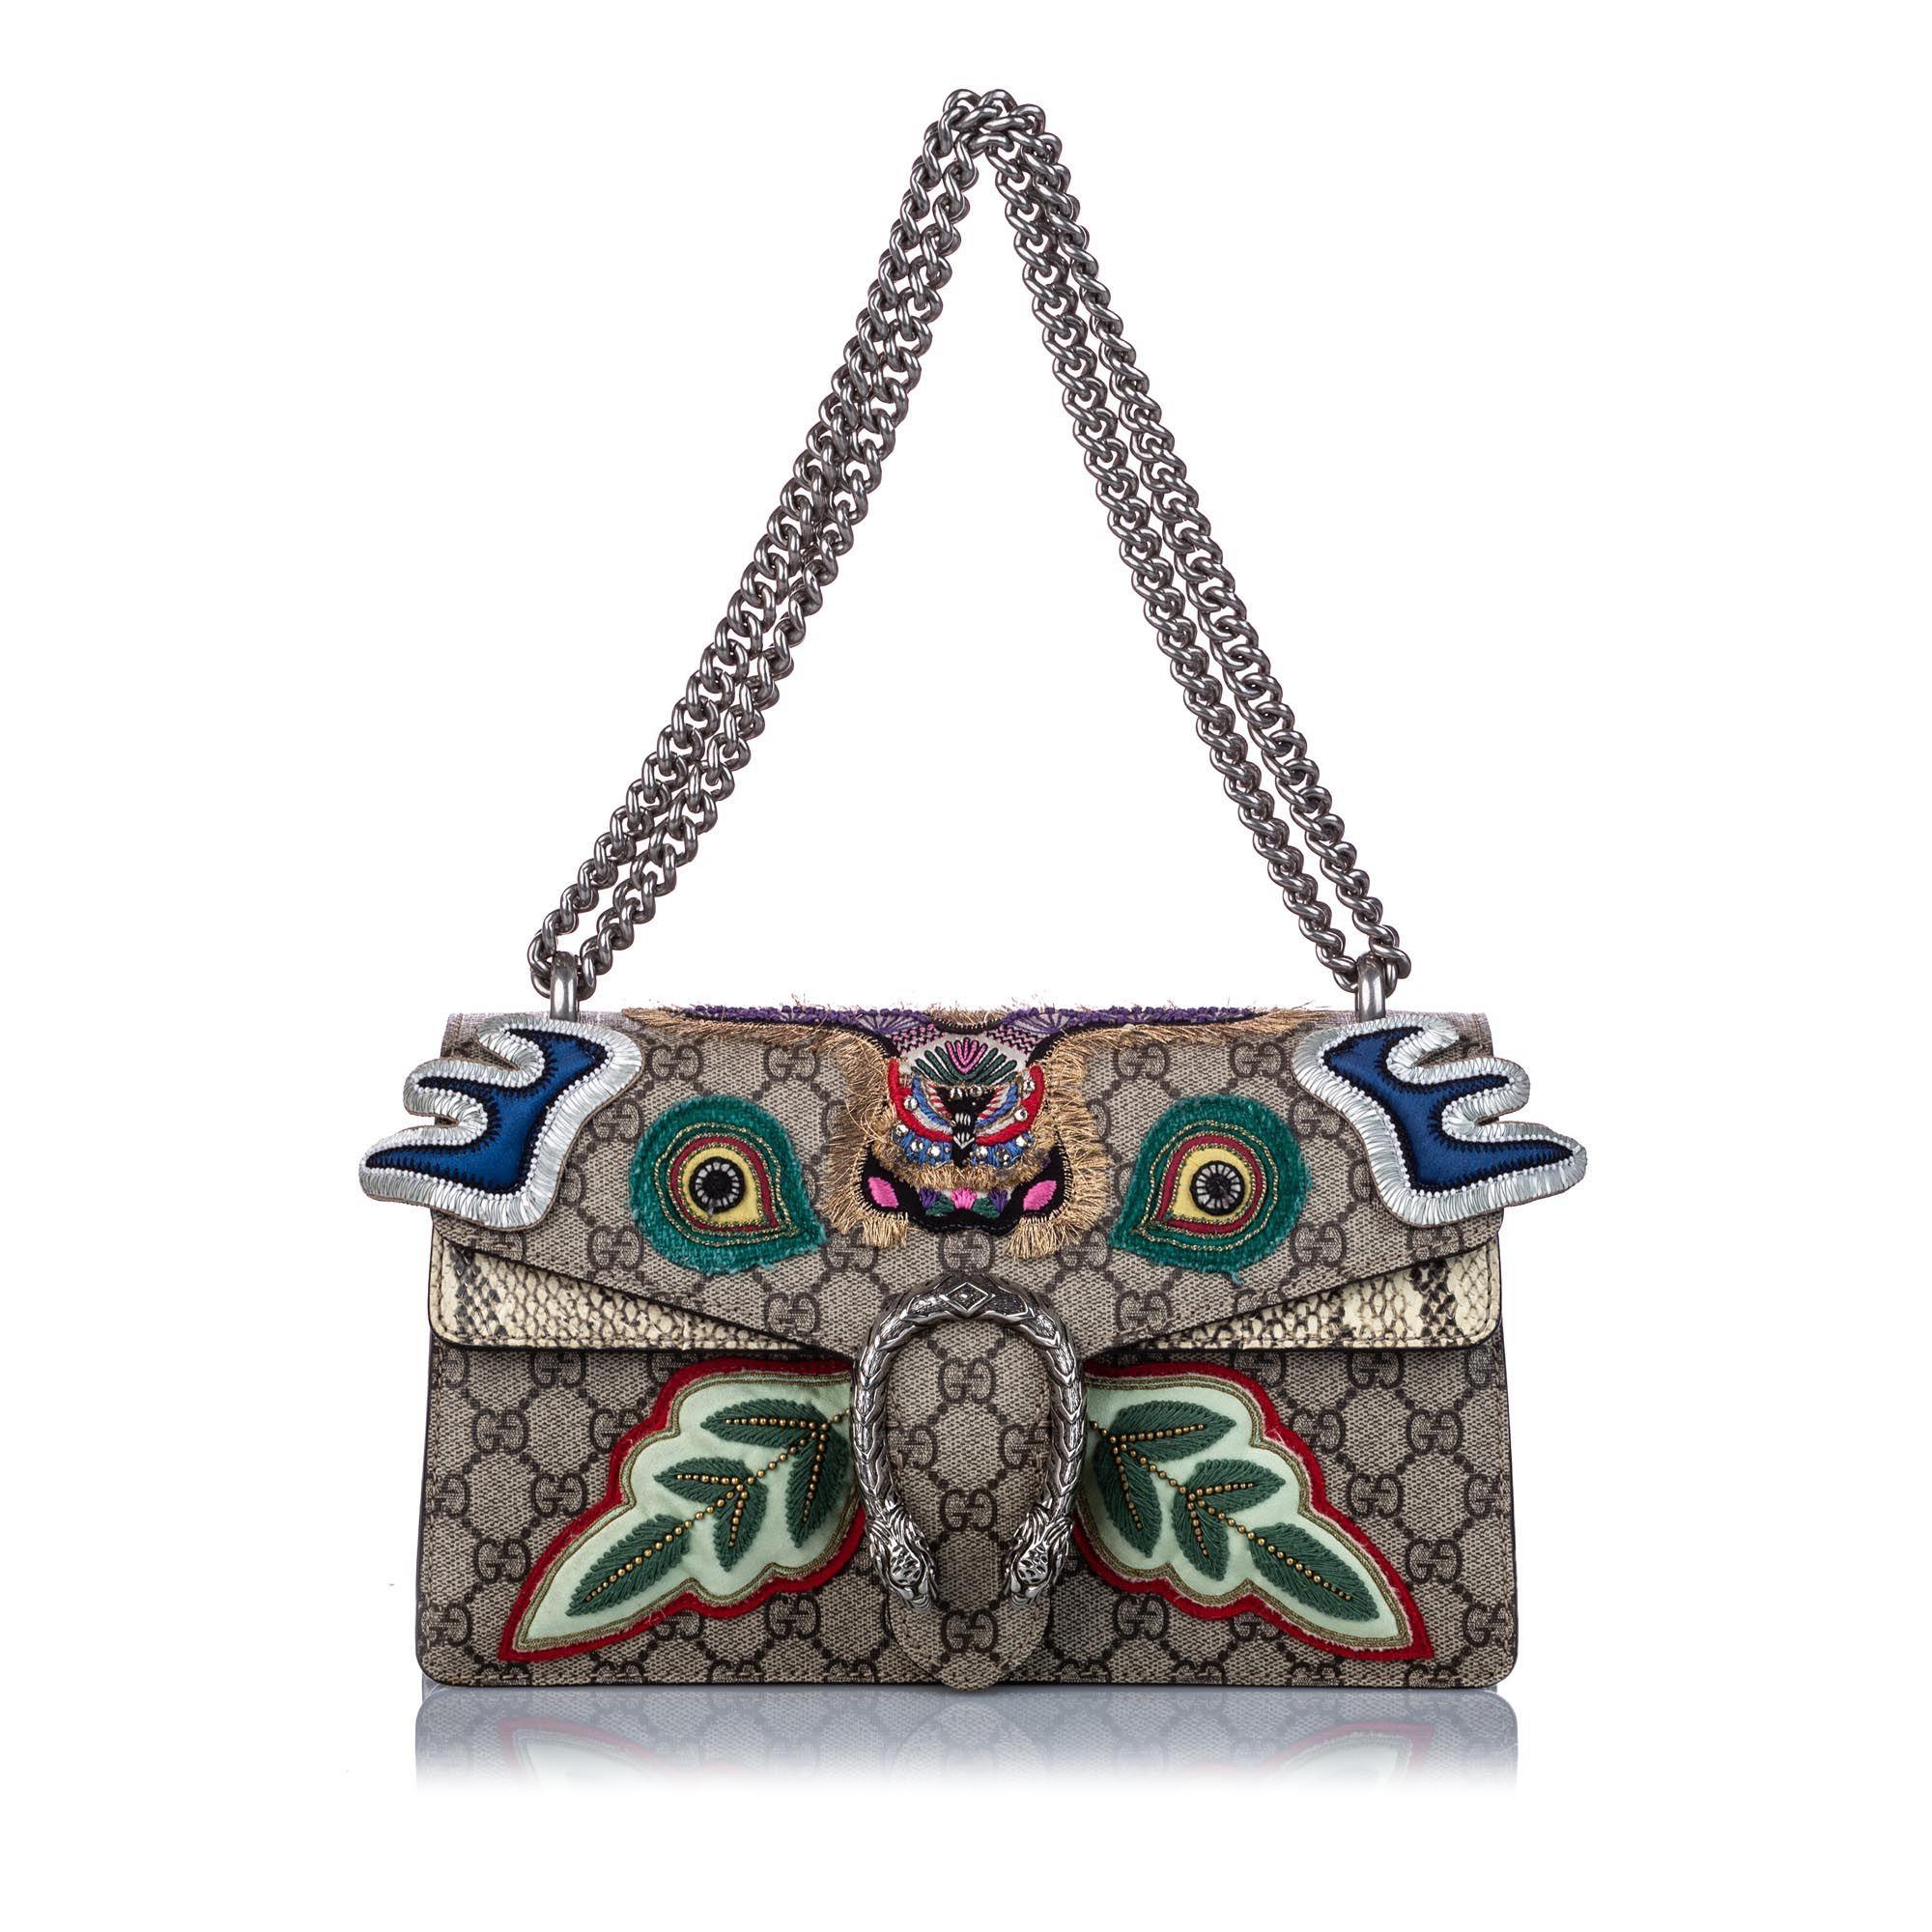 Vintage Gucci Small GG Supreme Embroidered Dionysus Shoulder Bag Brown